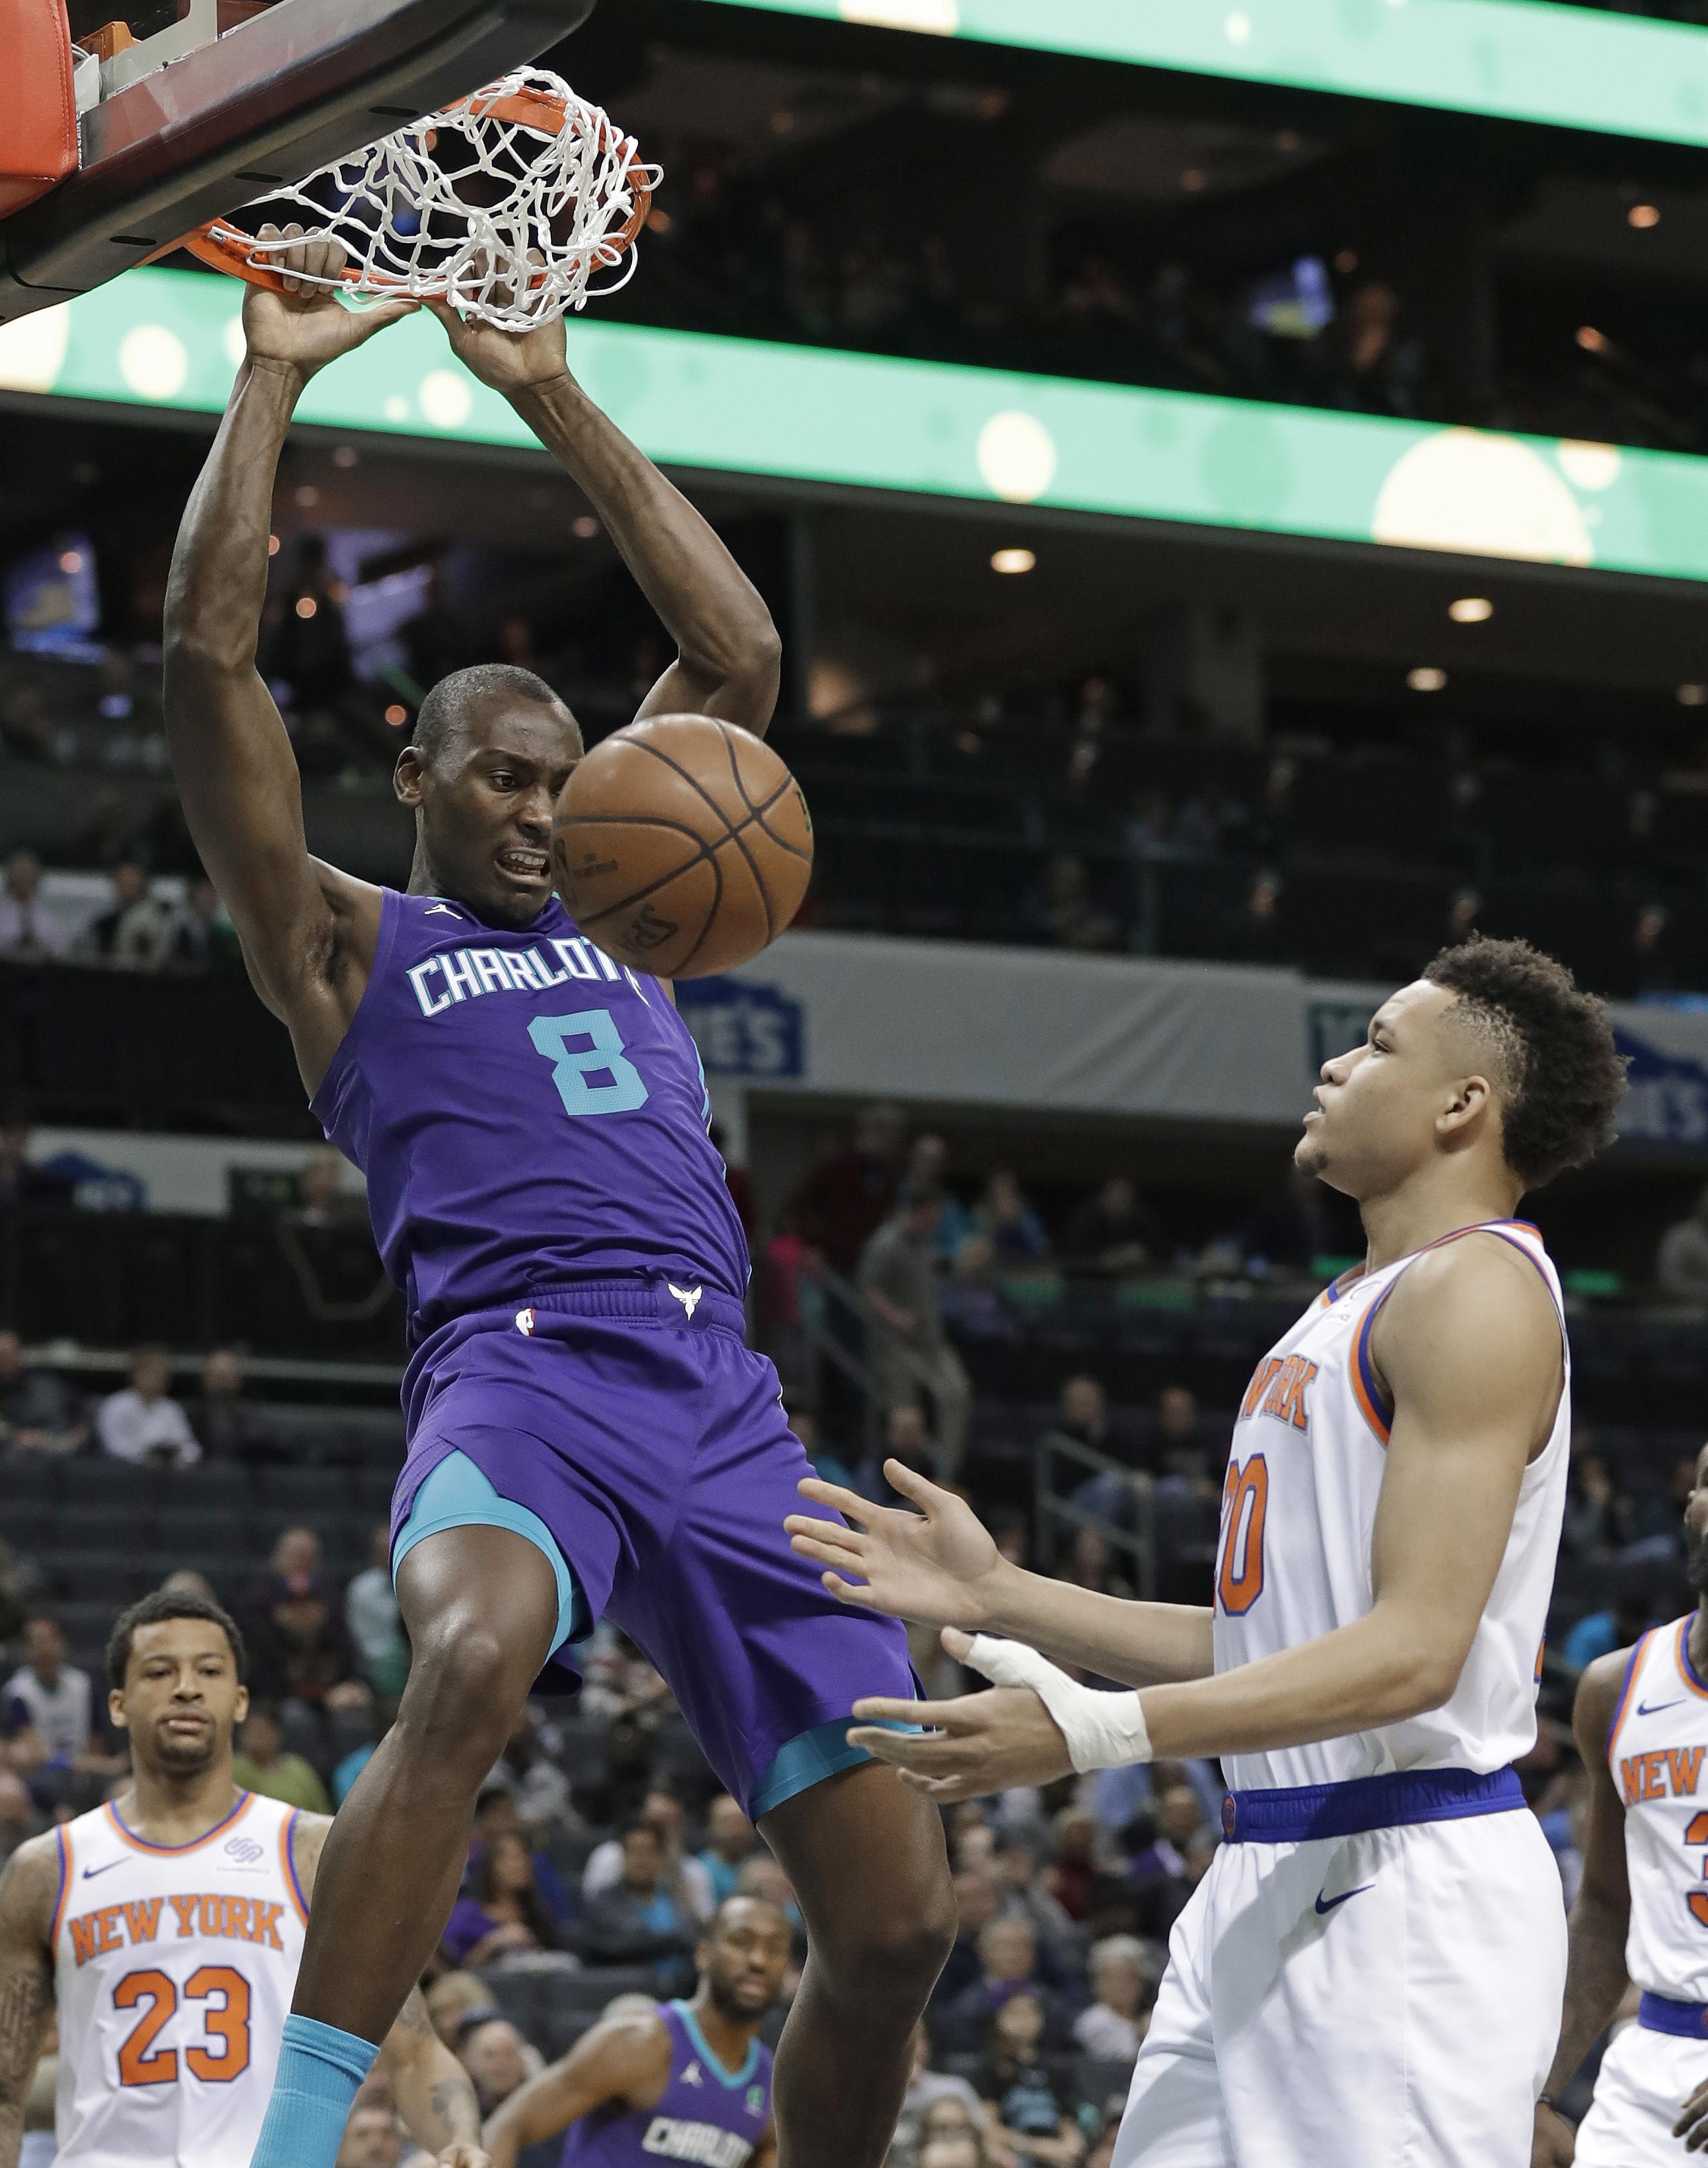 Monk's big fourth quarter lifts Hornets past Knicks 101-92